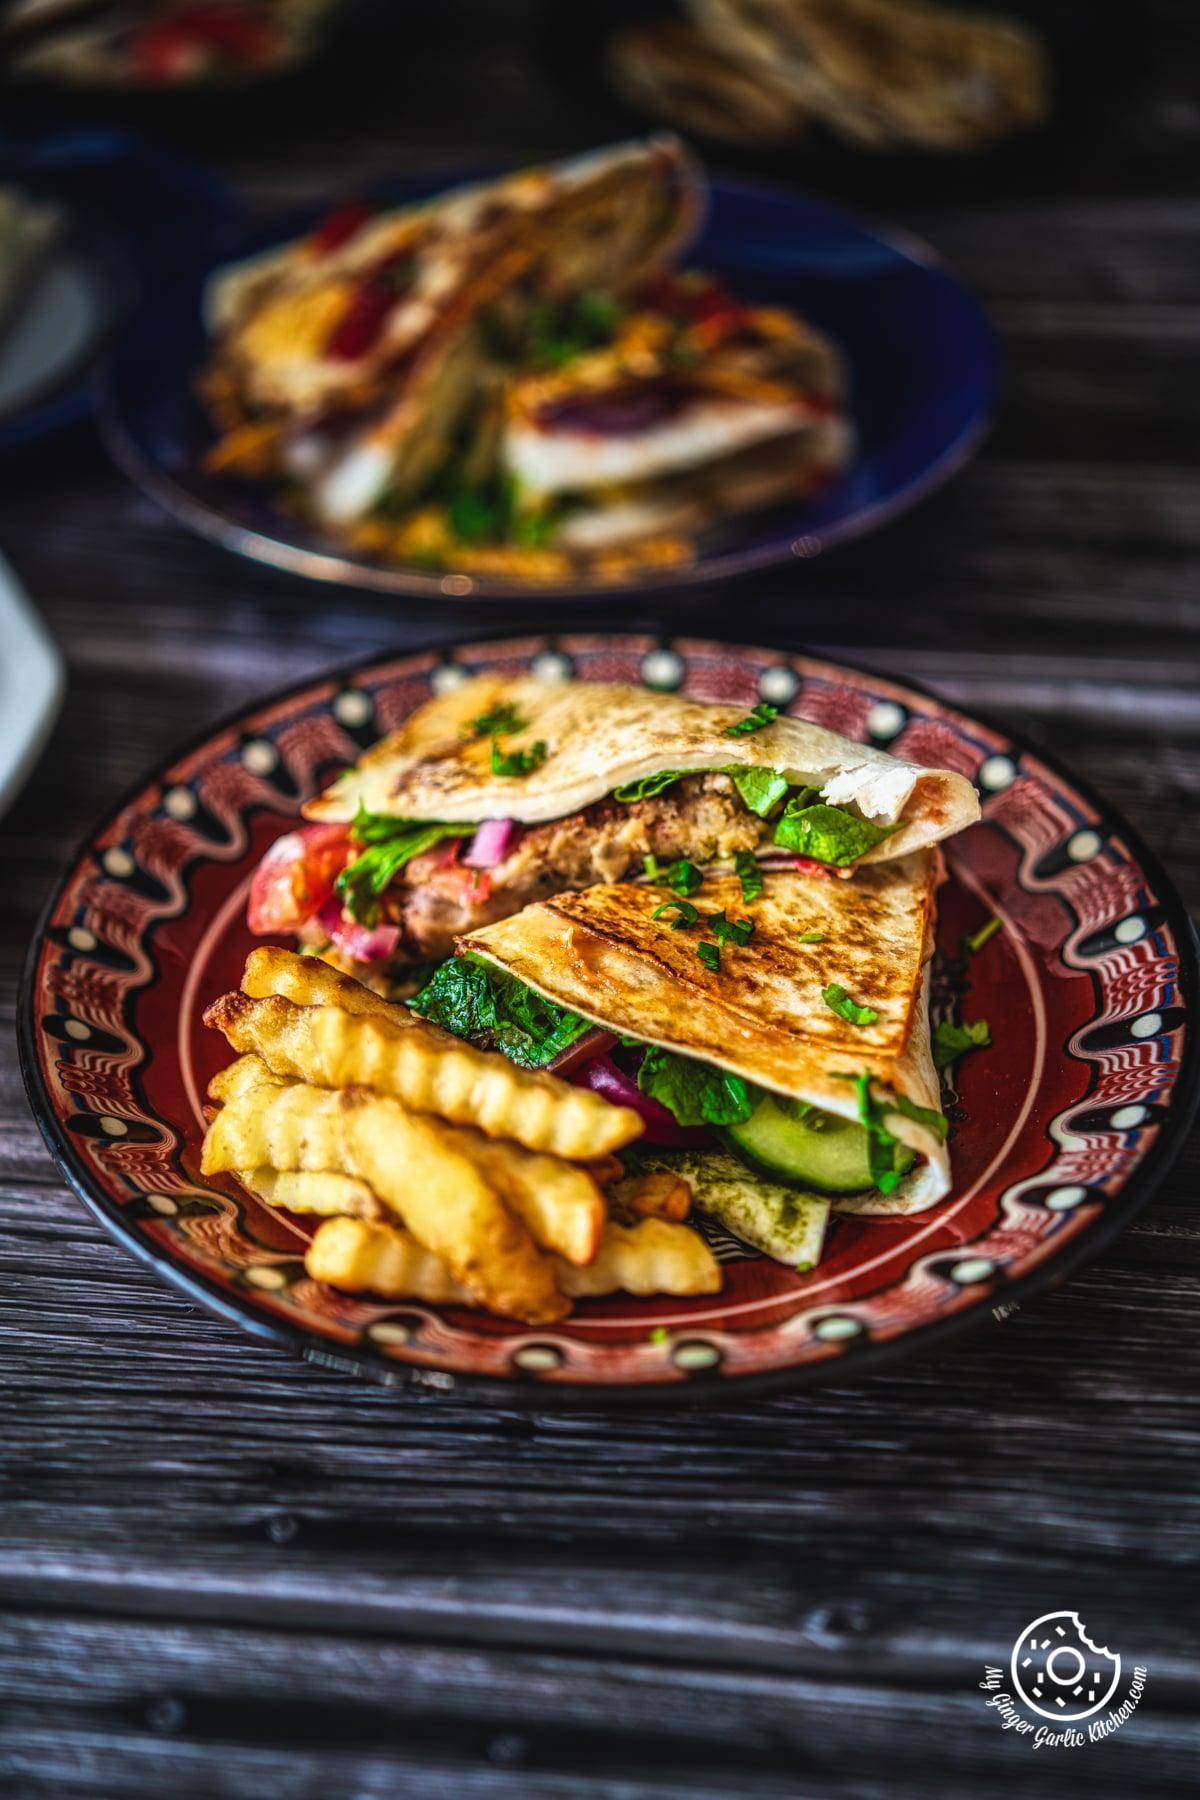 aloo tikki tortilla wrap served in a brown plate